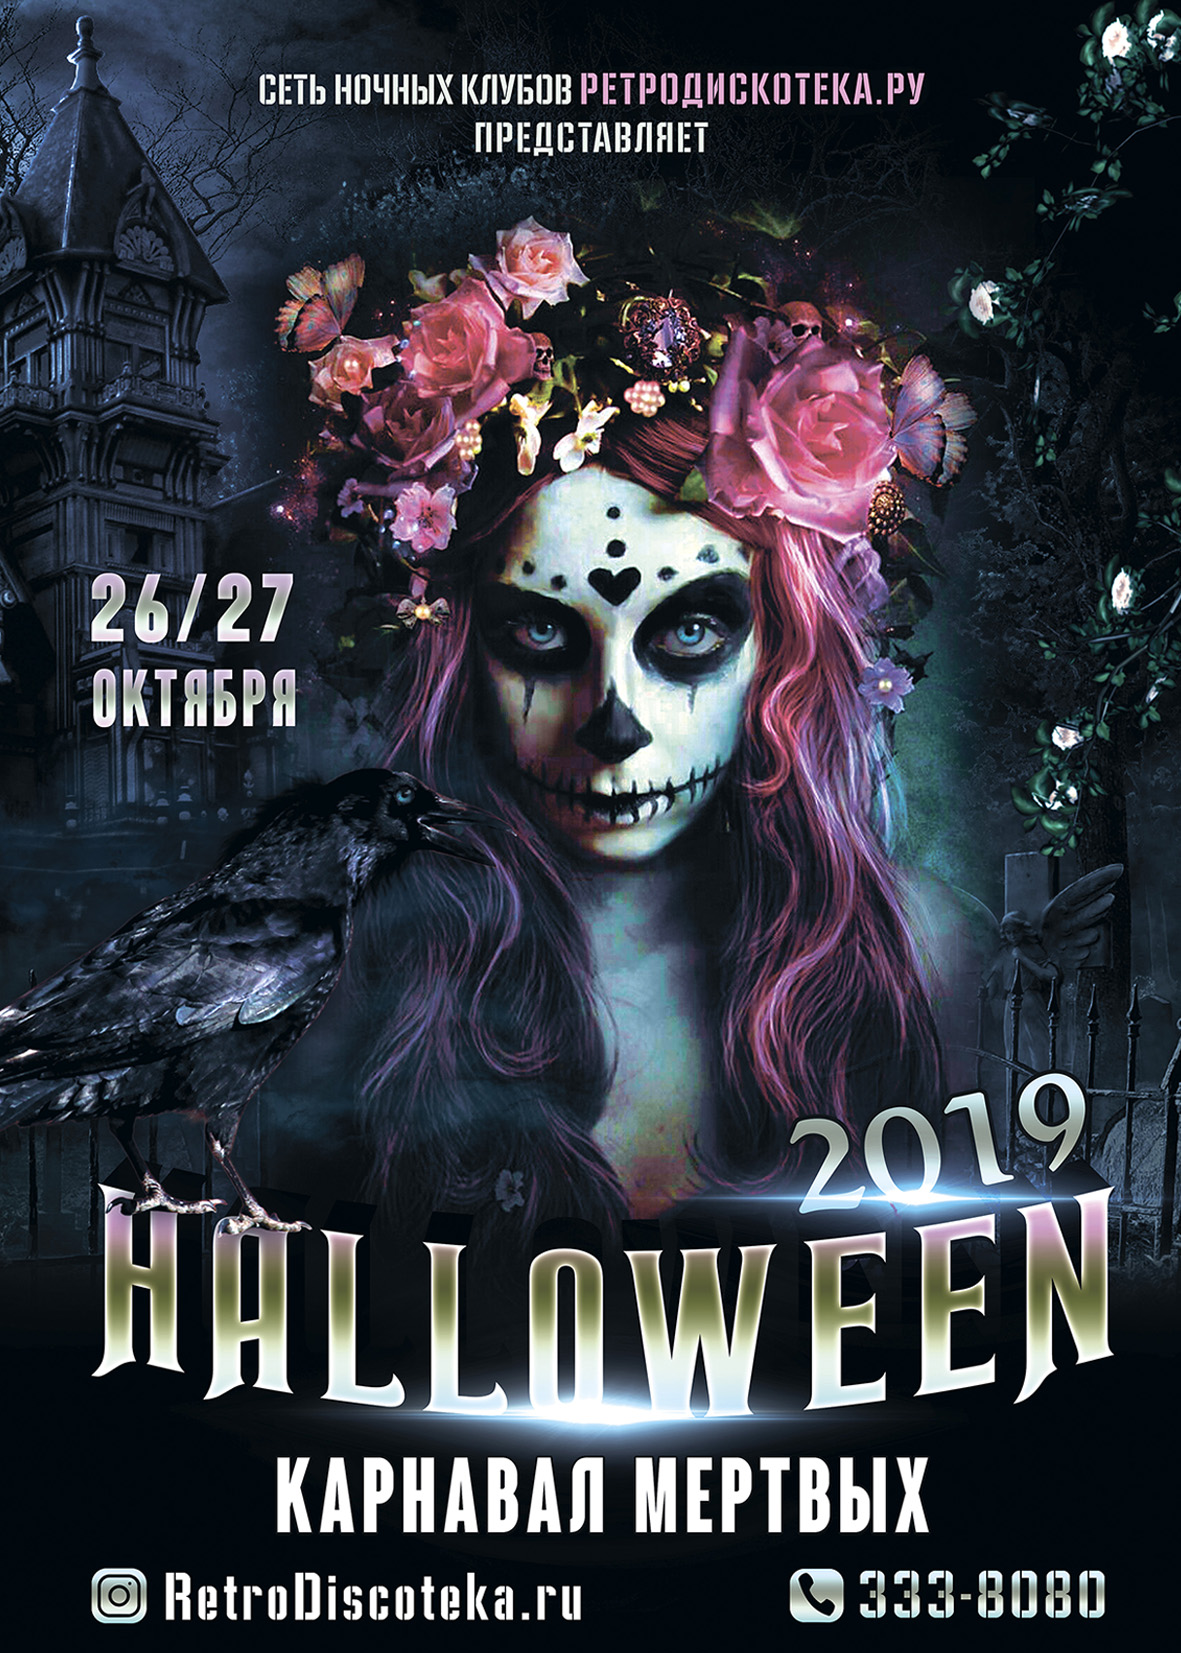 Дизайн афиши Хэллоуин 2019 для сети ночных клубов фото f_1565c6322bfd0c23.jpg